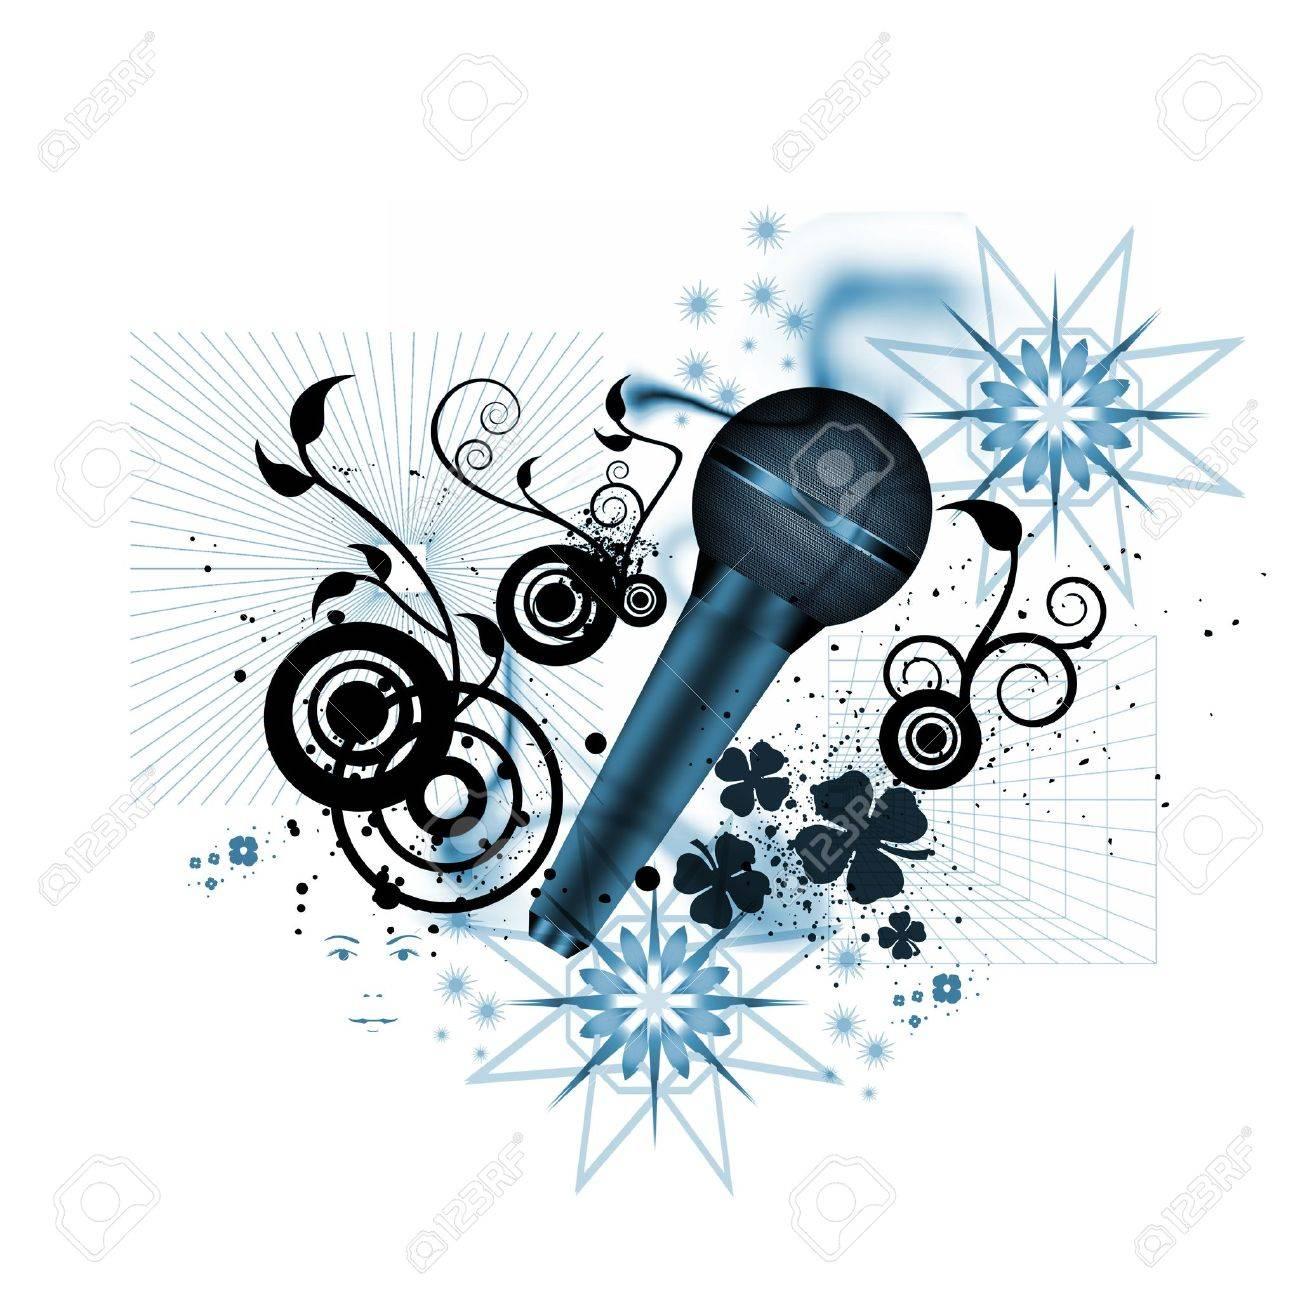 music concept Stock Photo - 9560376